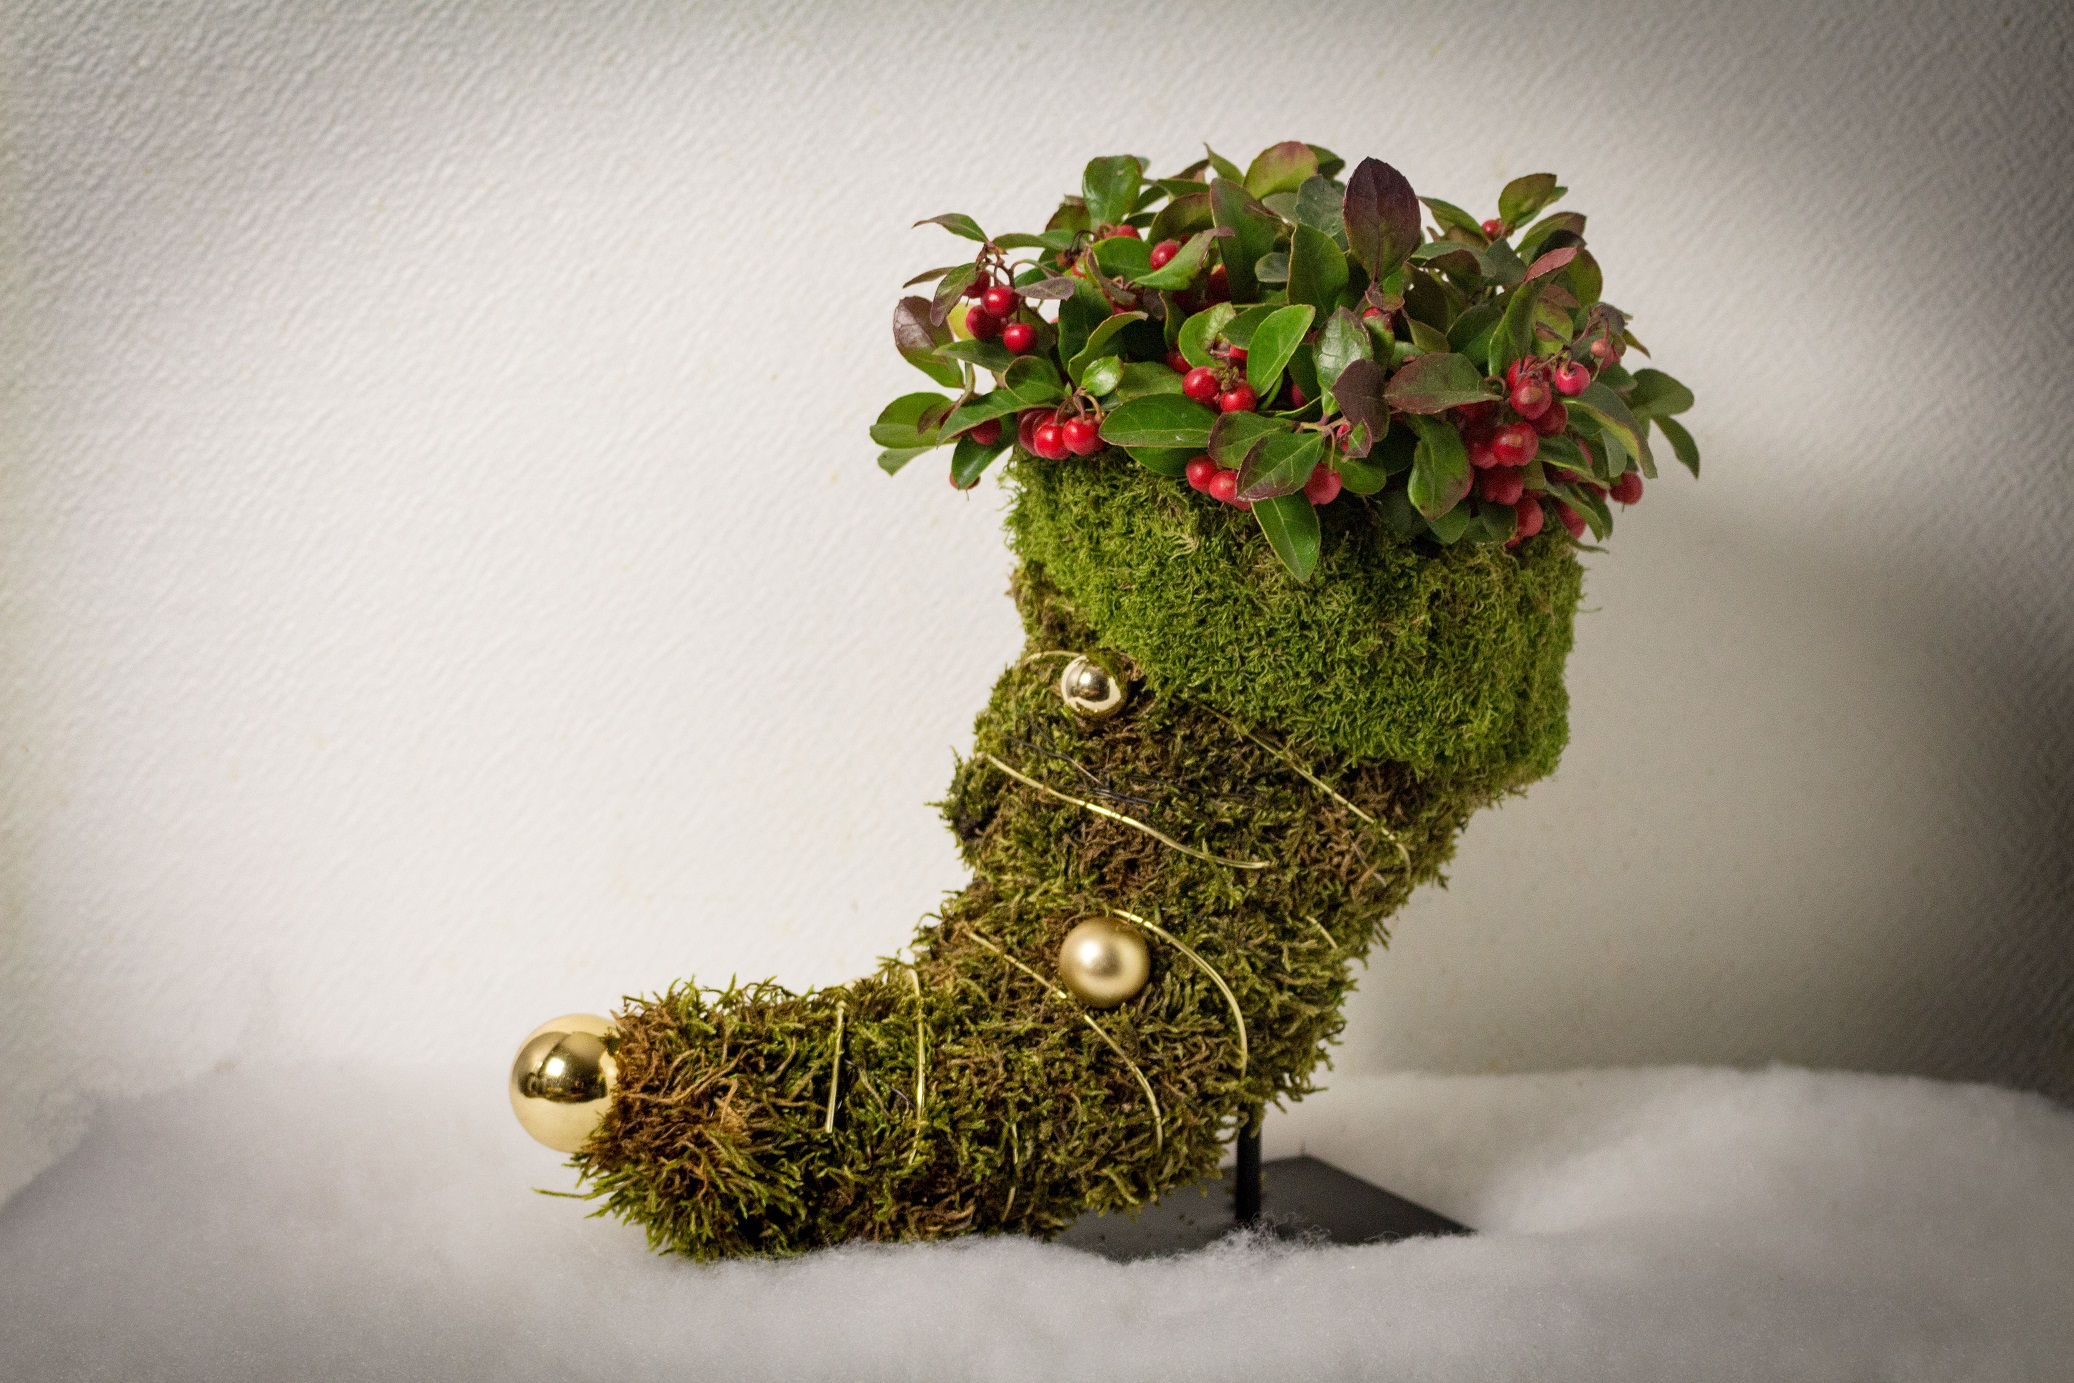 Botte fleurie de Noël